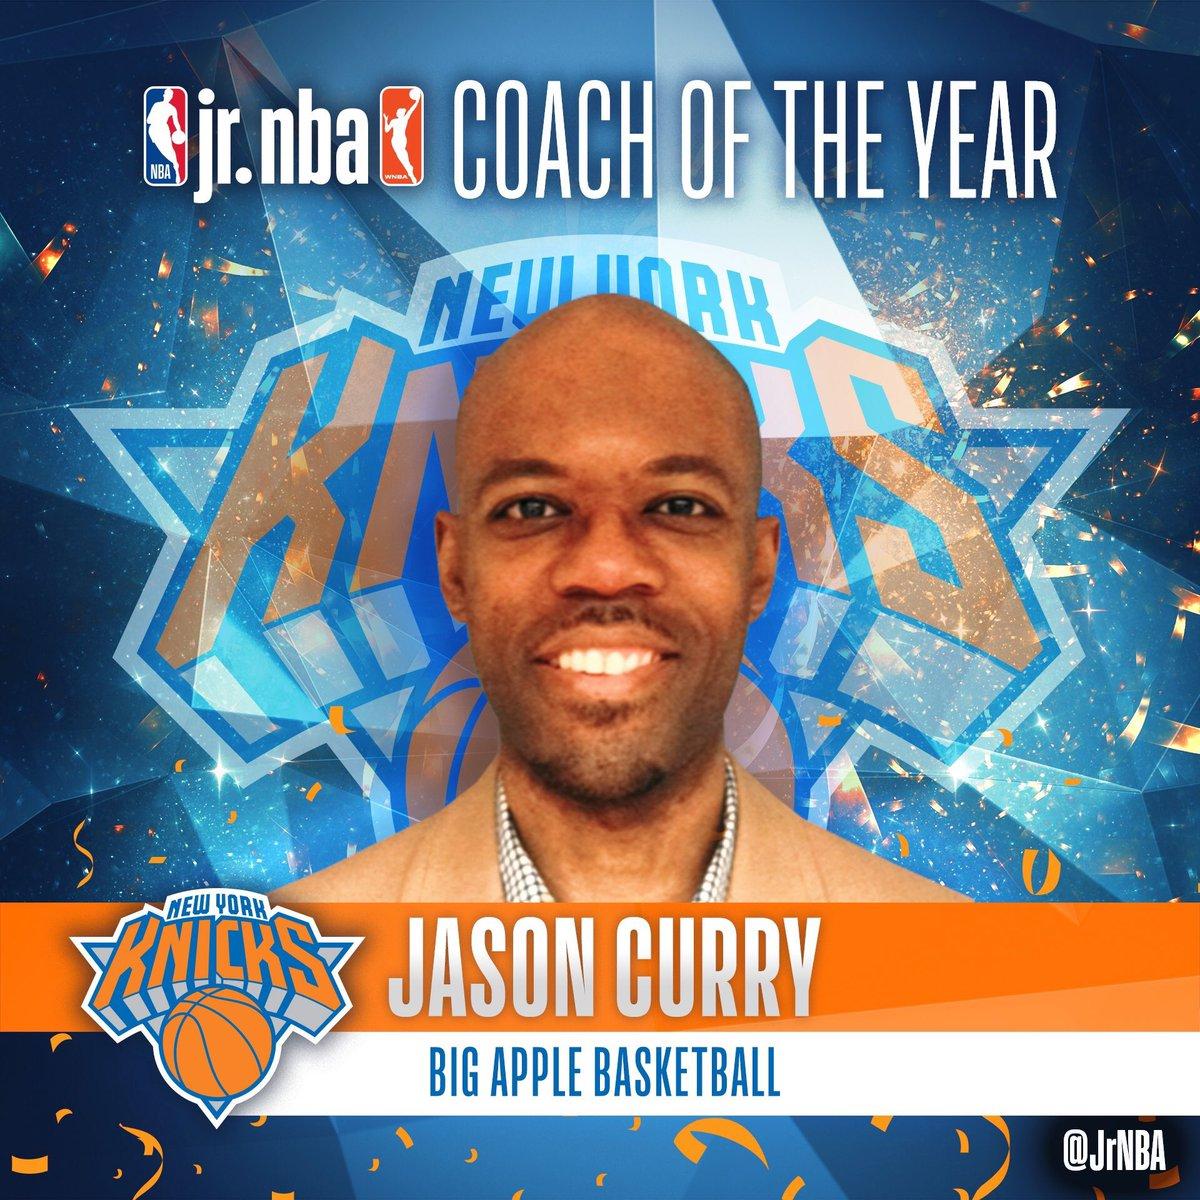 CONGRATULATIONS to #BAB🏀coach #JasonCurry on winning the 2019 @jrnba #JrNBACOY • The award was presented by @dallasmavs Head Coach, #RickCarlisle , @espn announcer @franfraschilla & #NYKnicks legend @ALLAN_HOUSTON • @jasoncurry_nyc @juniorknicks @nyknicks